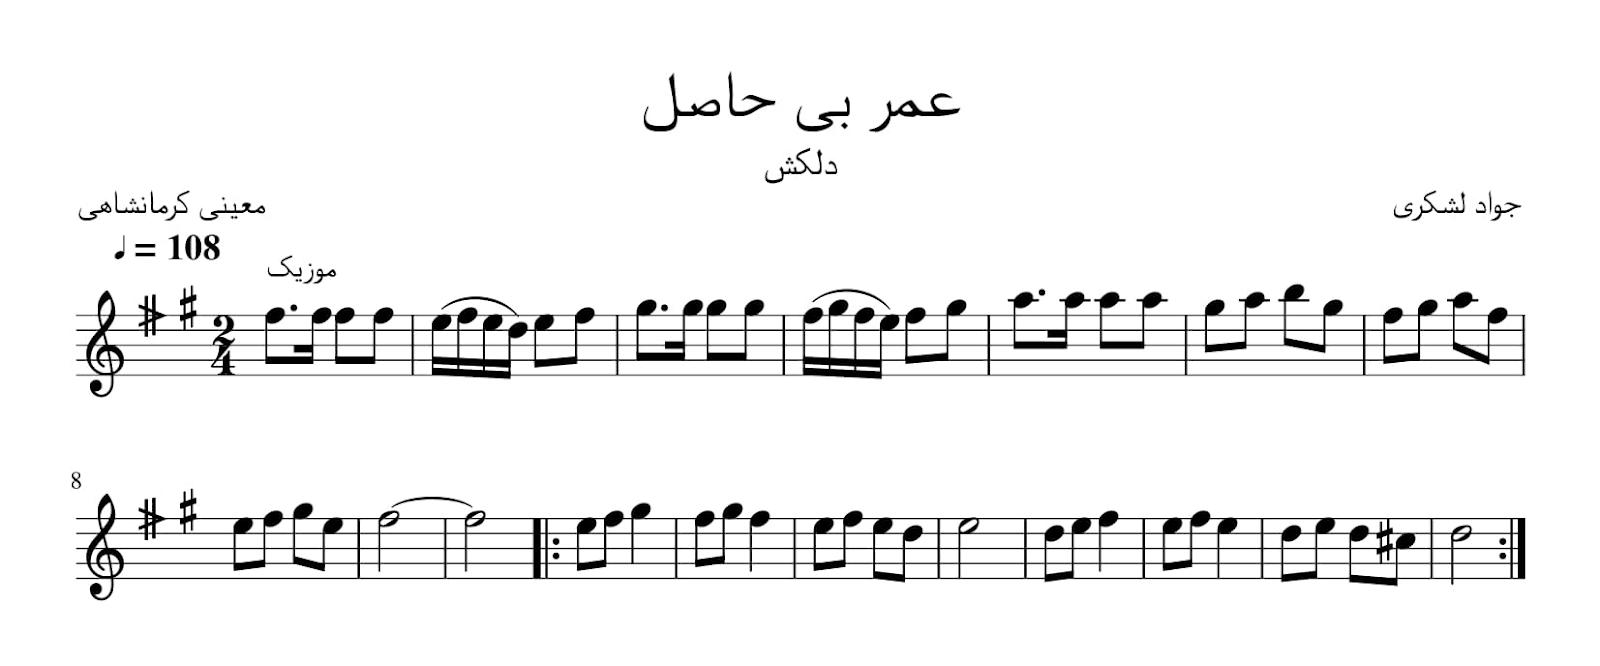 نت عمر بیحاصل جواد لشگری رحیم معینی کرمانشاهی دلکش آوانگاری احمد جباریان